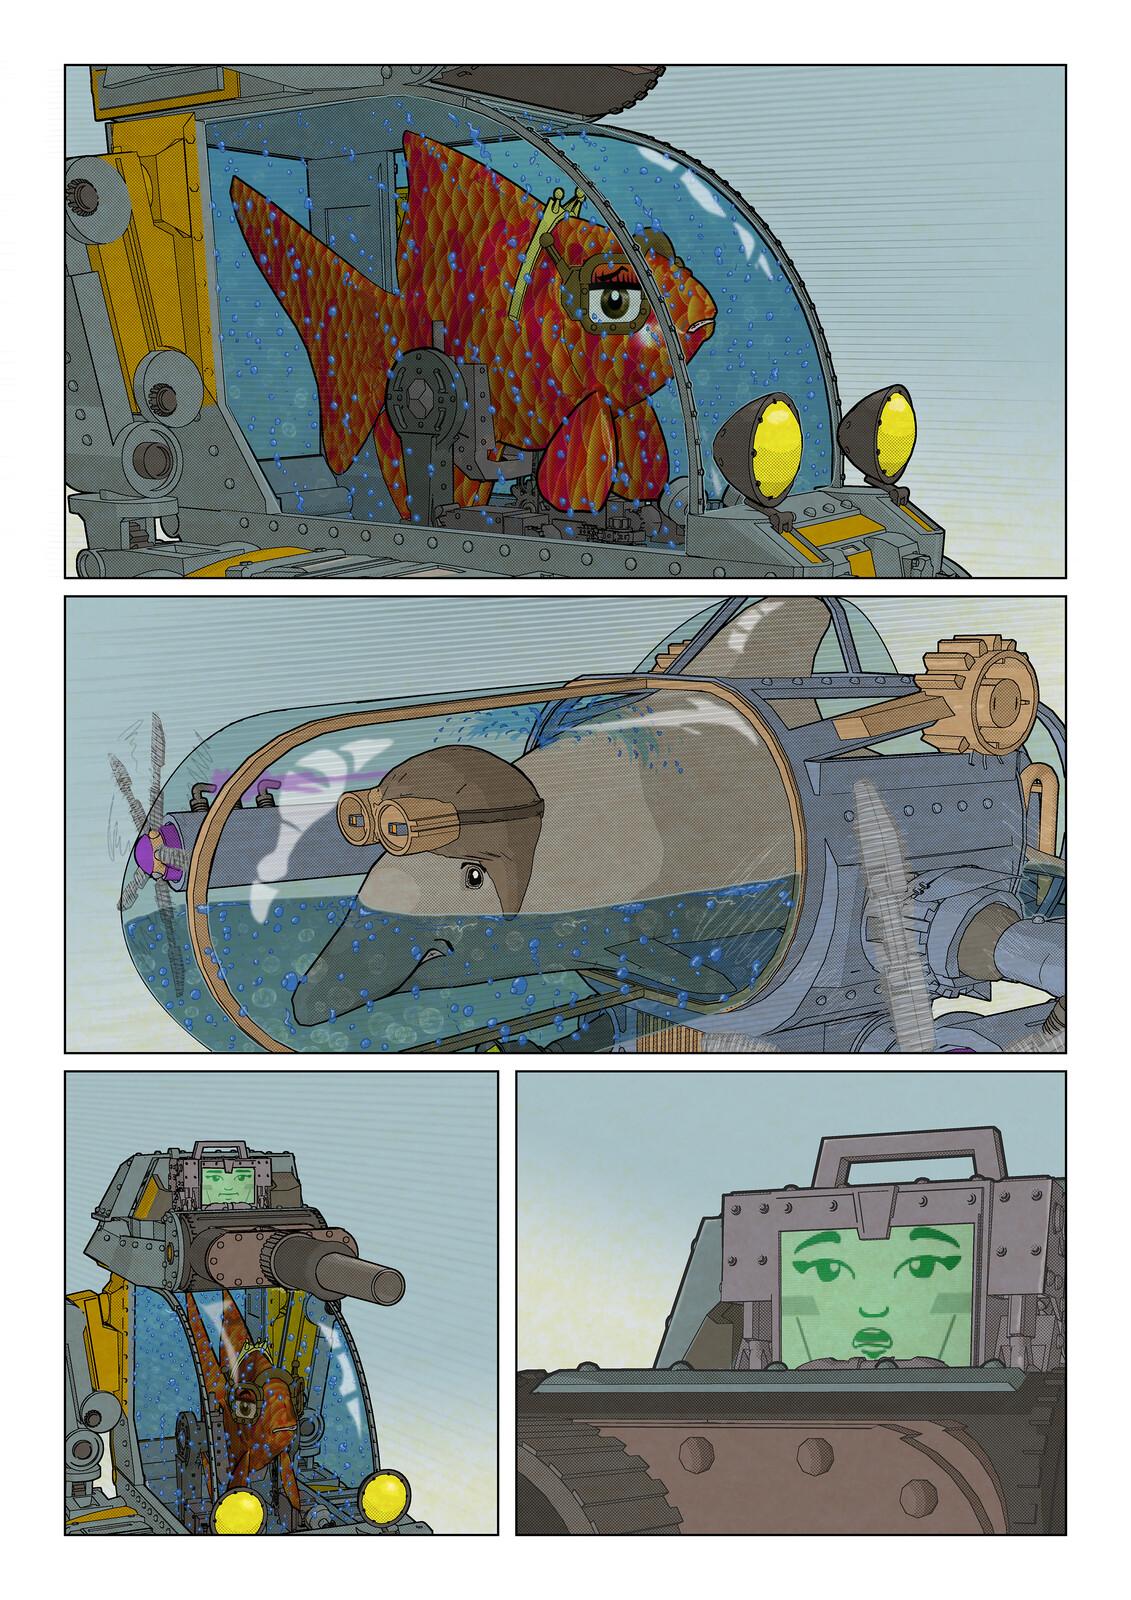 FishTank & Dolphinarium - comic page 3